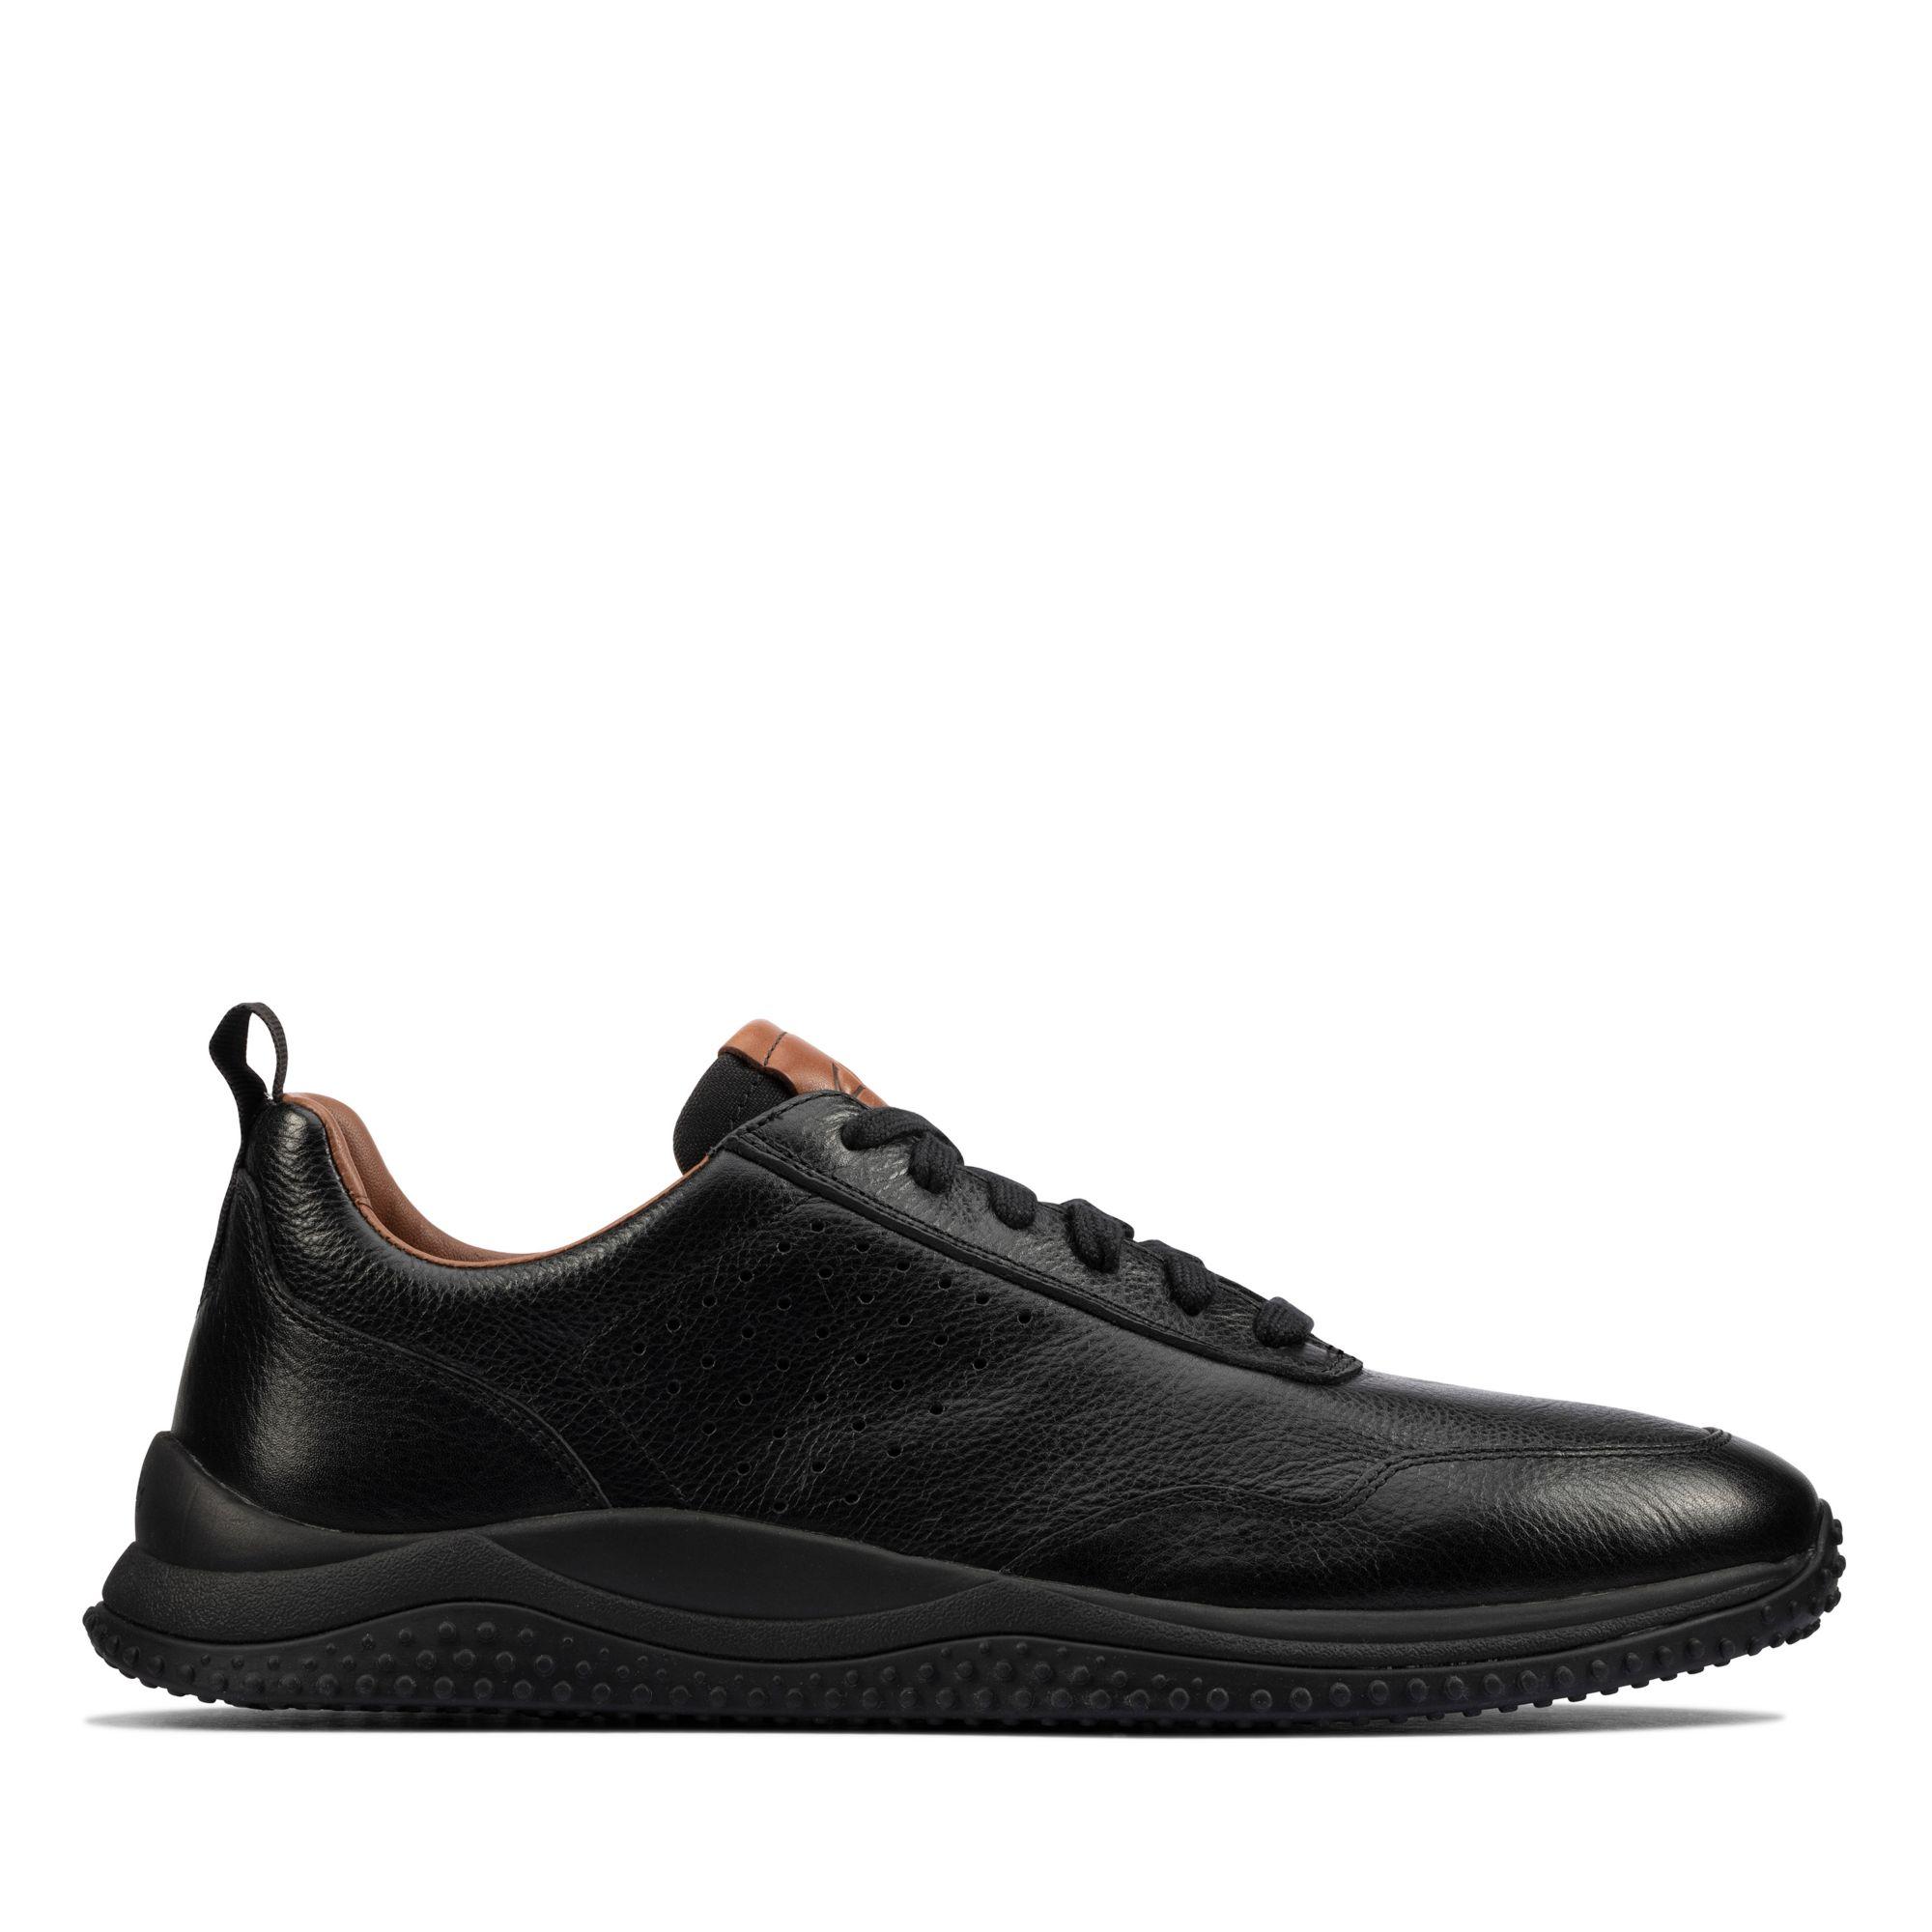 Clarks型格煥新-Puxton Lace全真皮透氣綁帶休閒鞋(黑色)